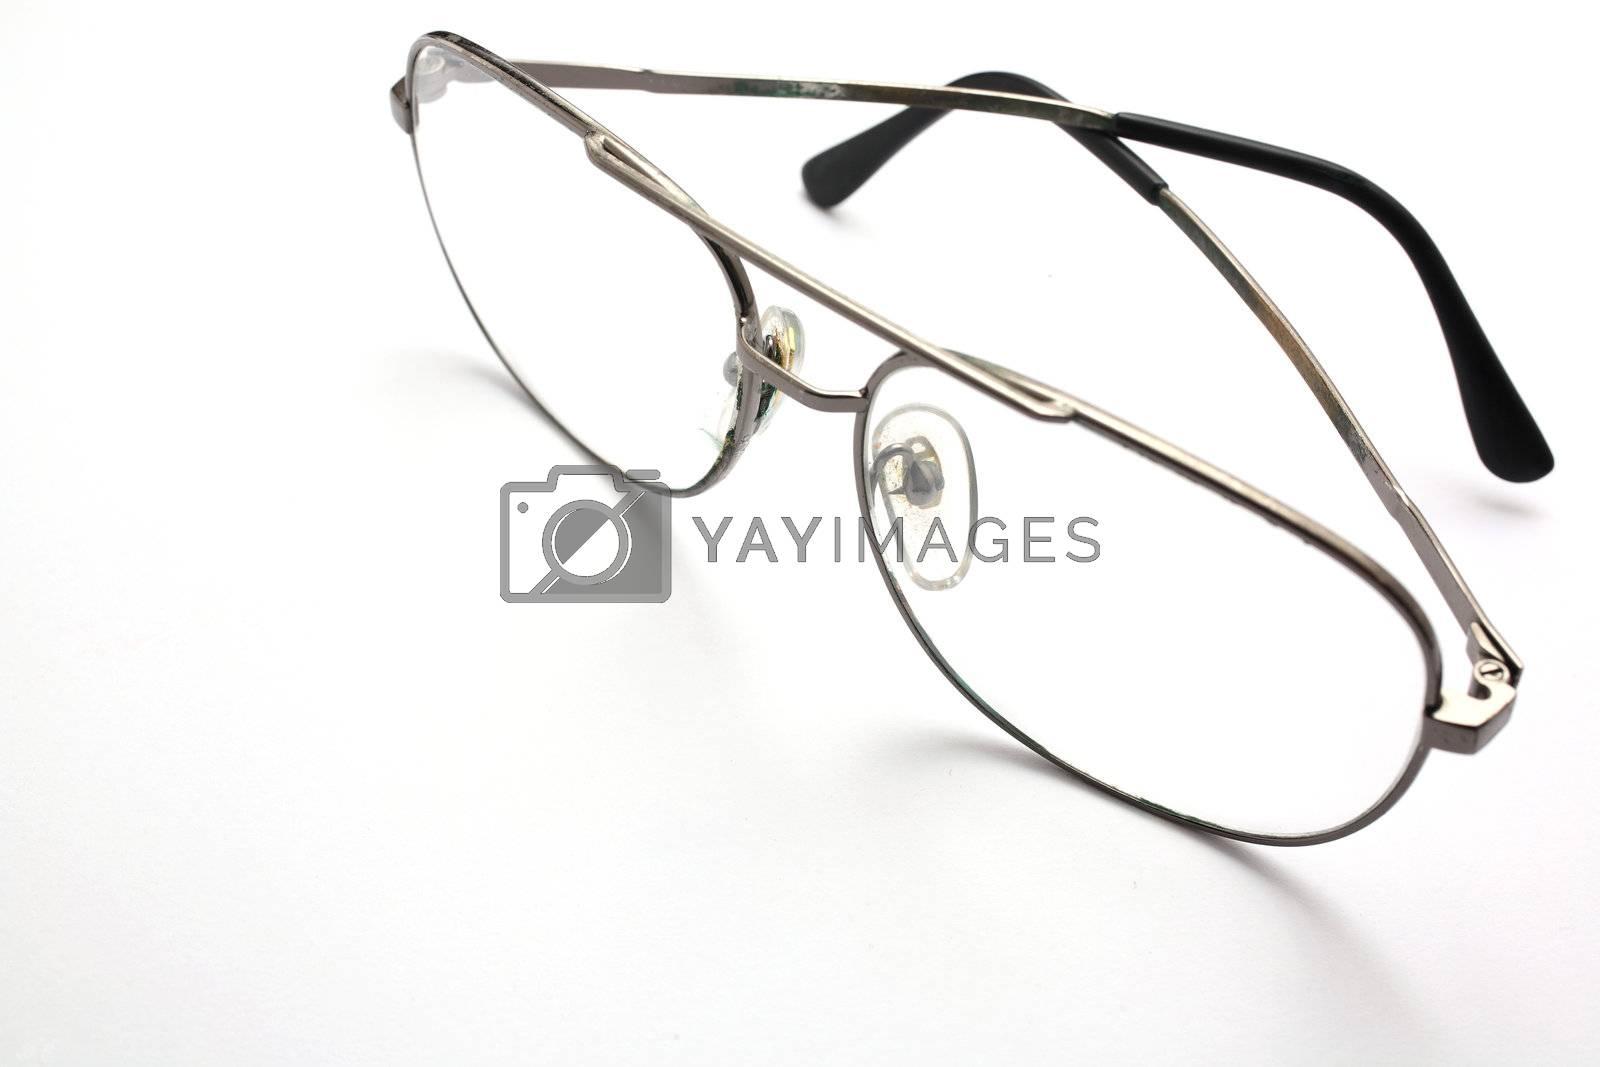 Eyeglasses  by leungchopan